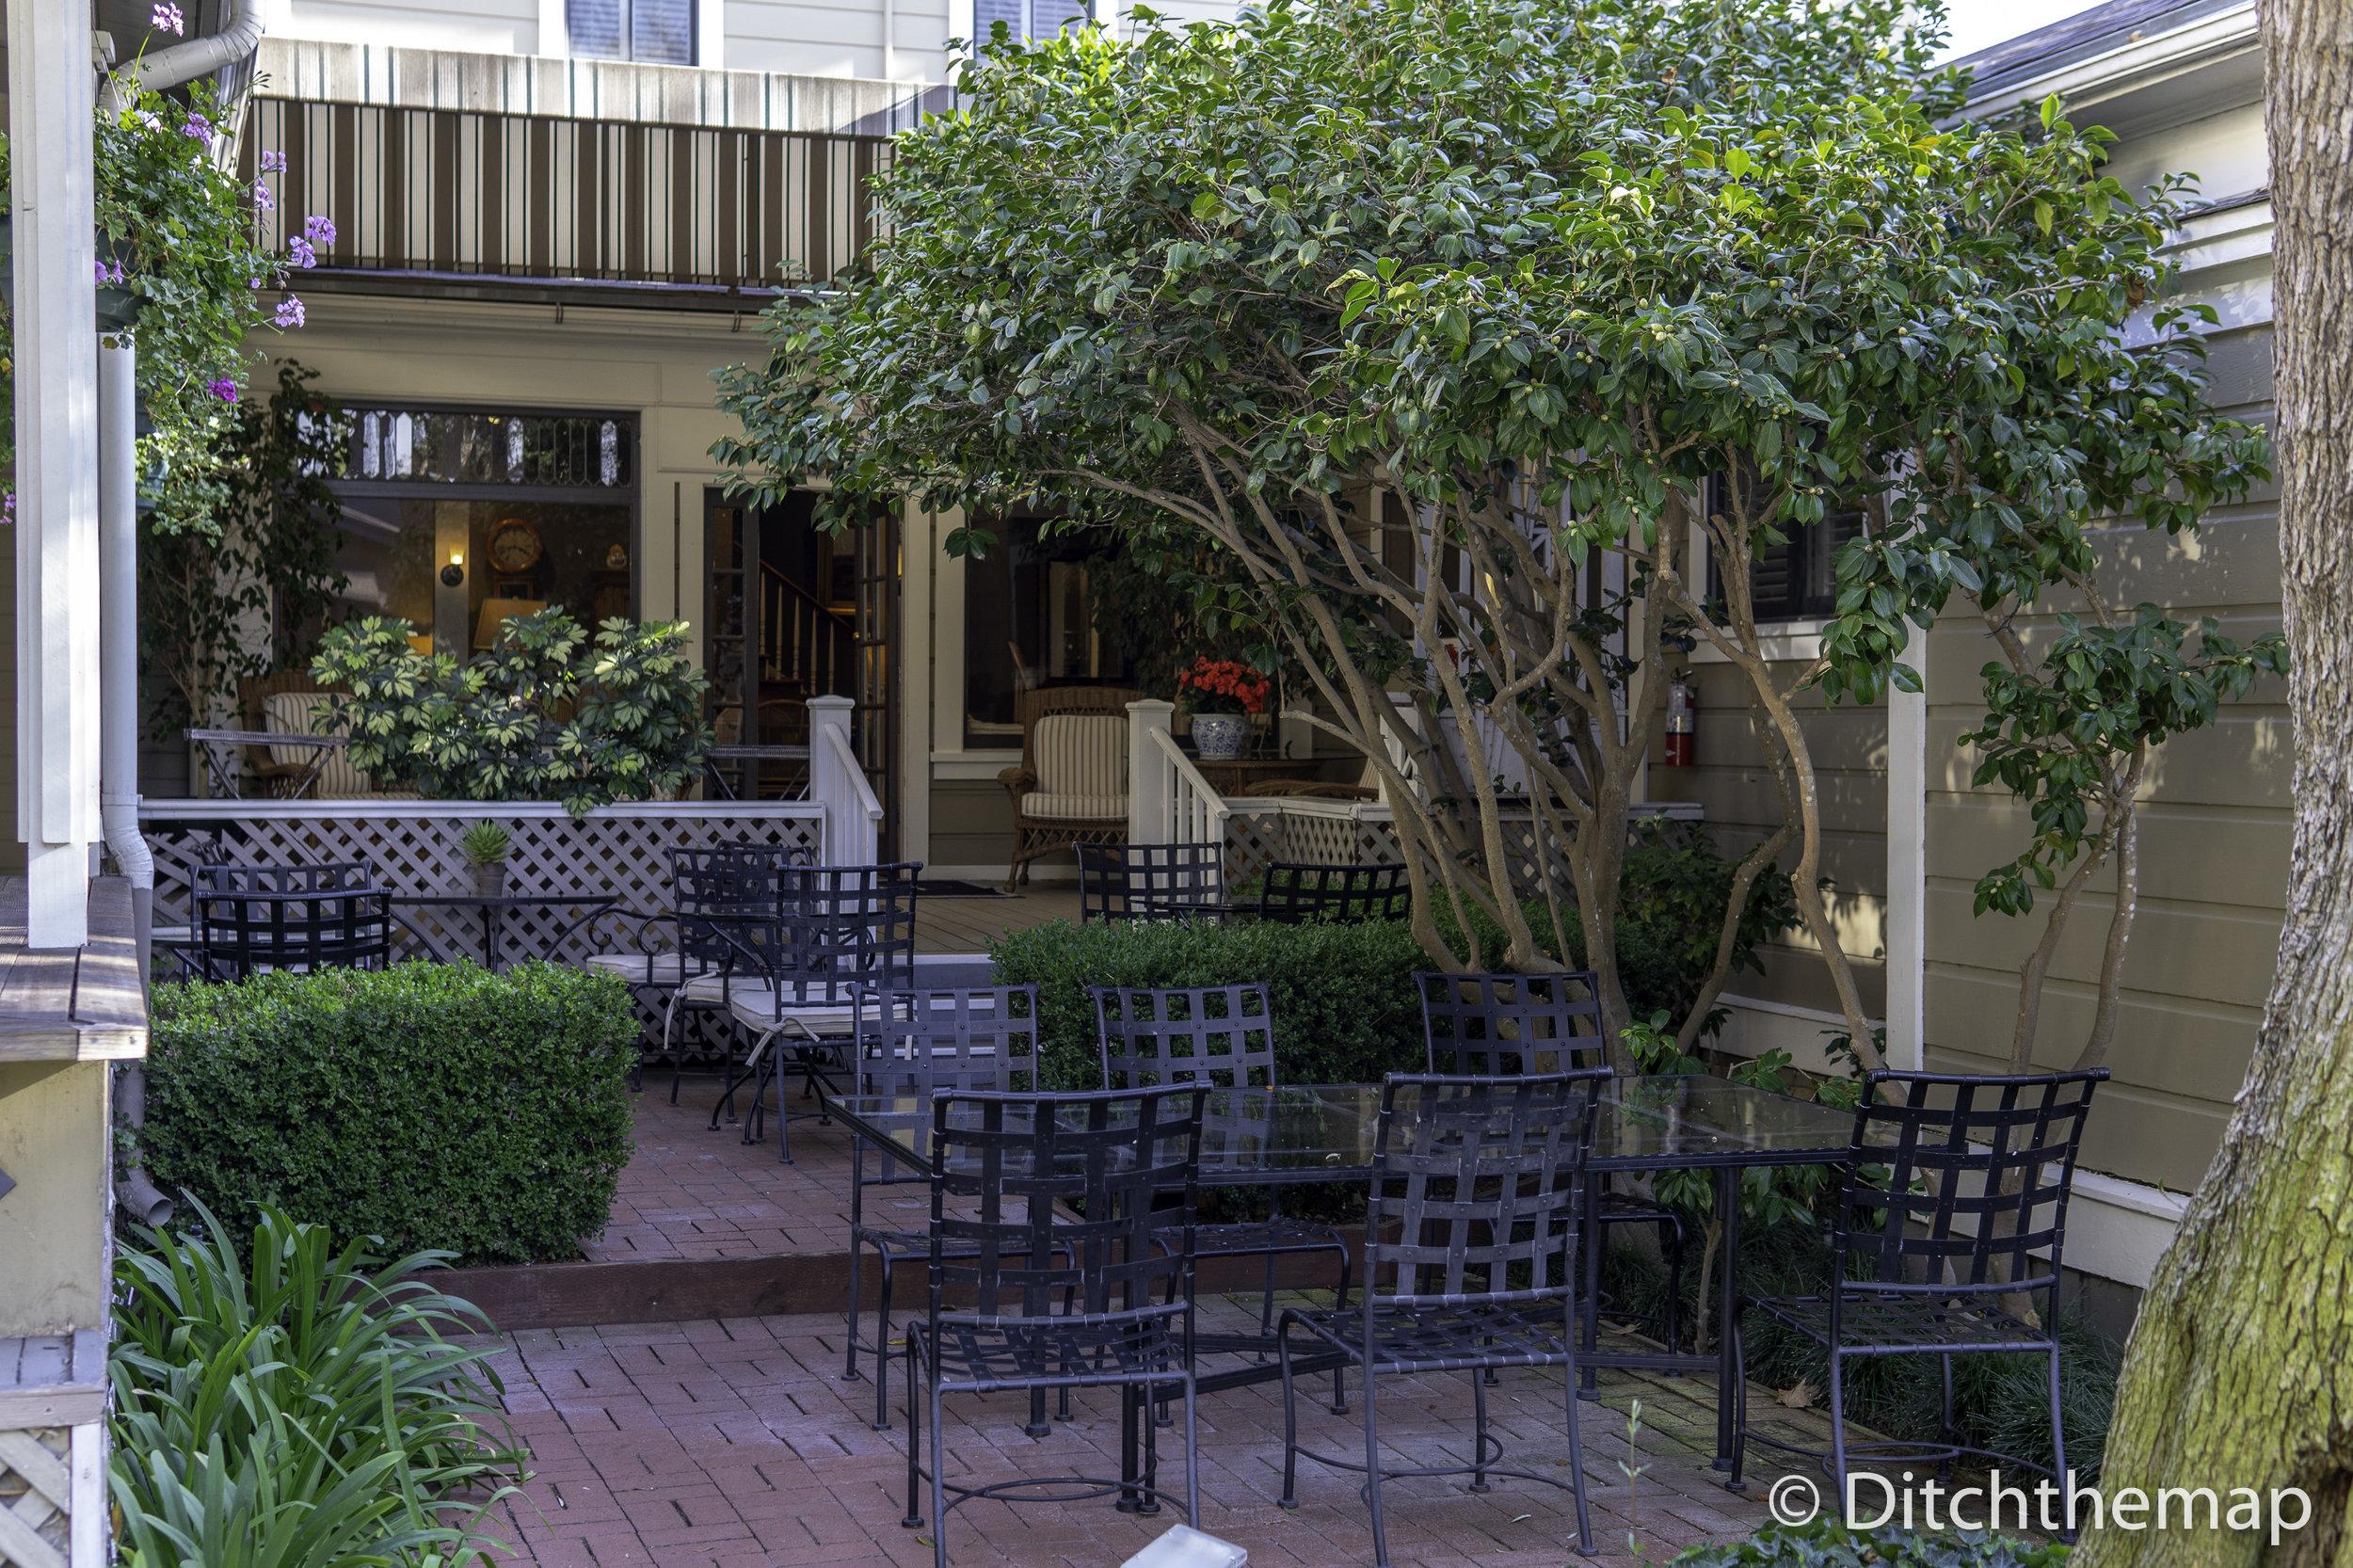 Upham Hotel in Santa Barbara, California